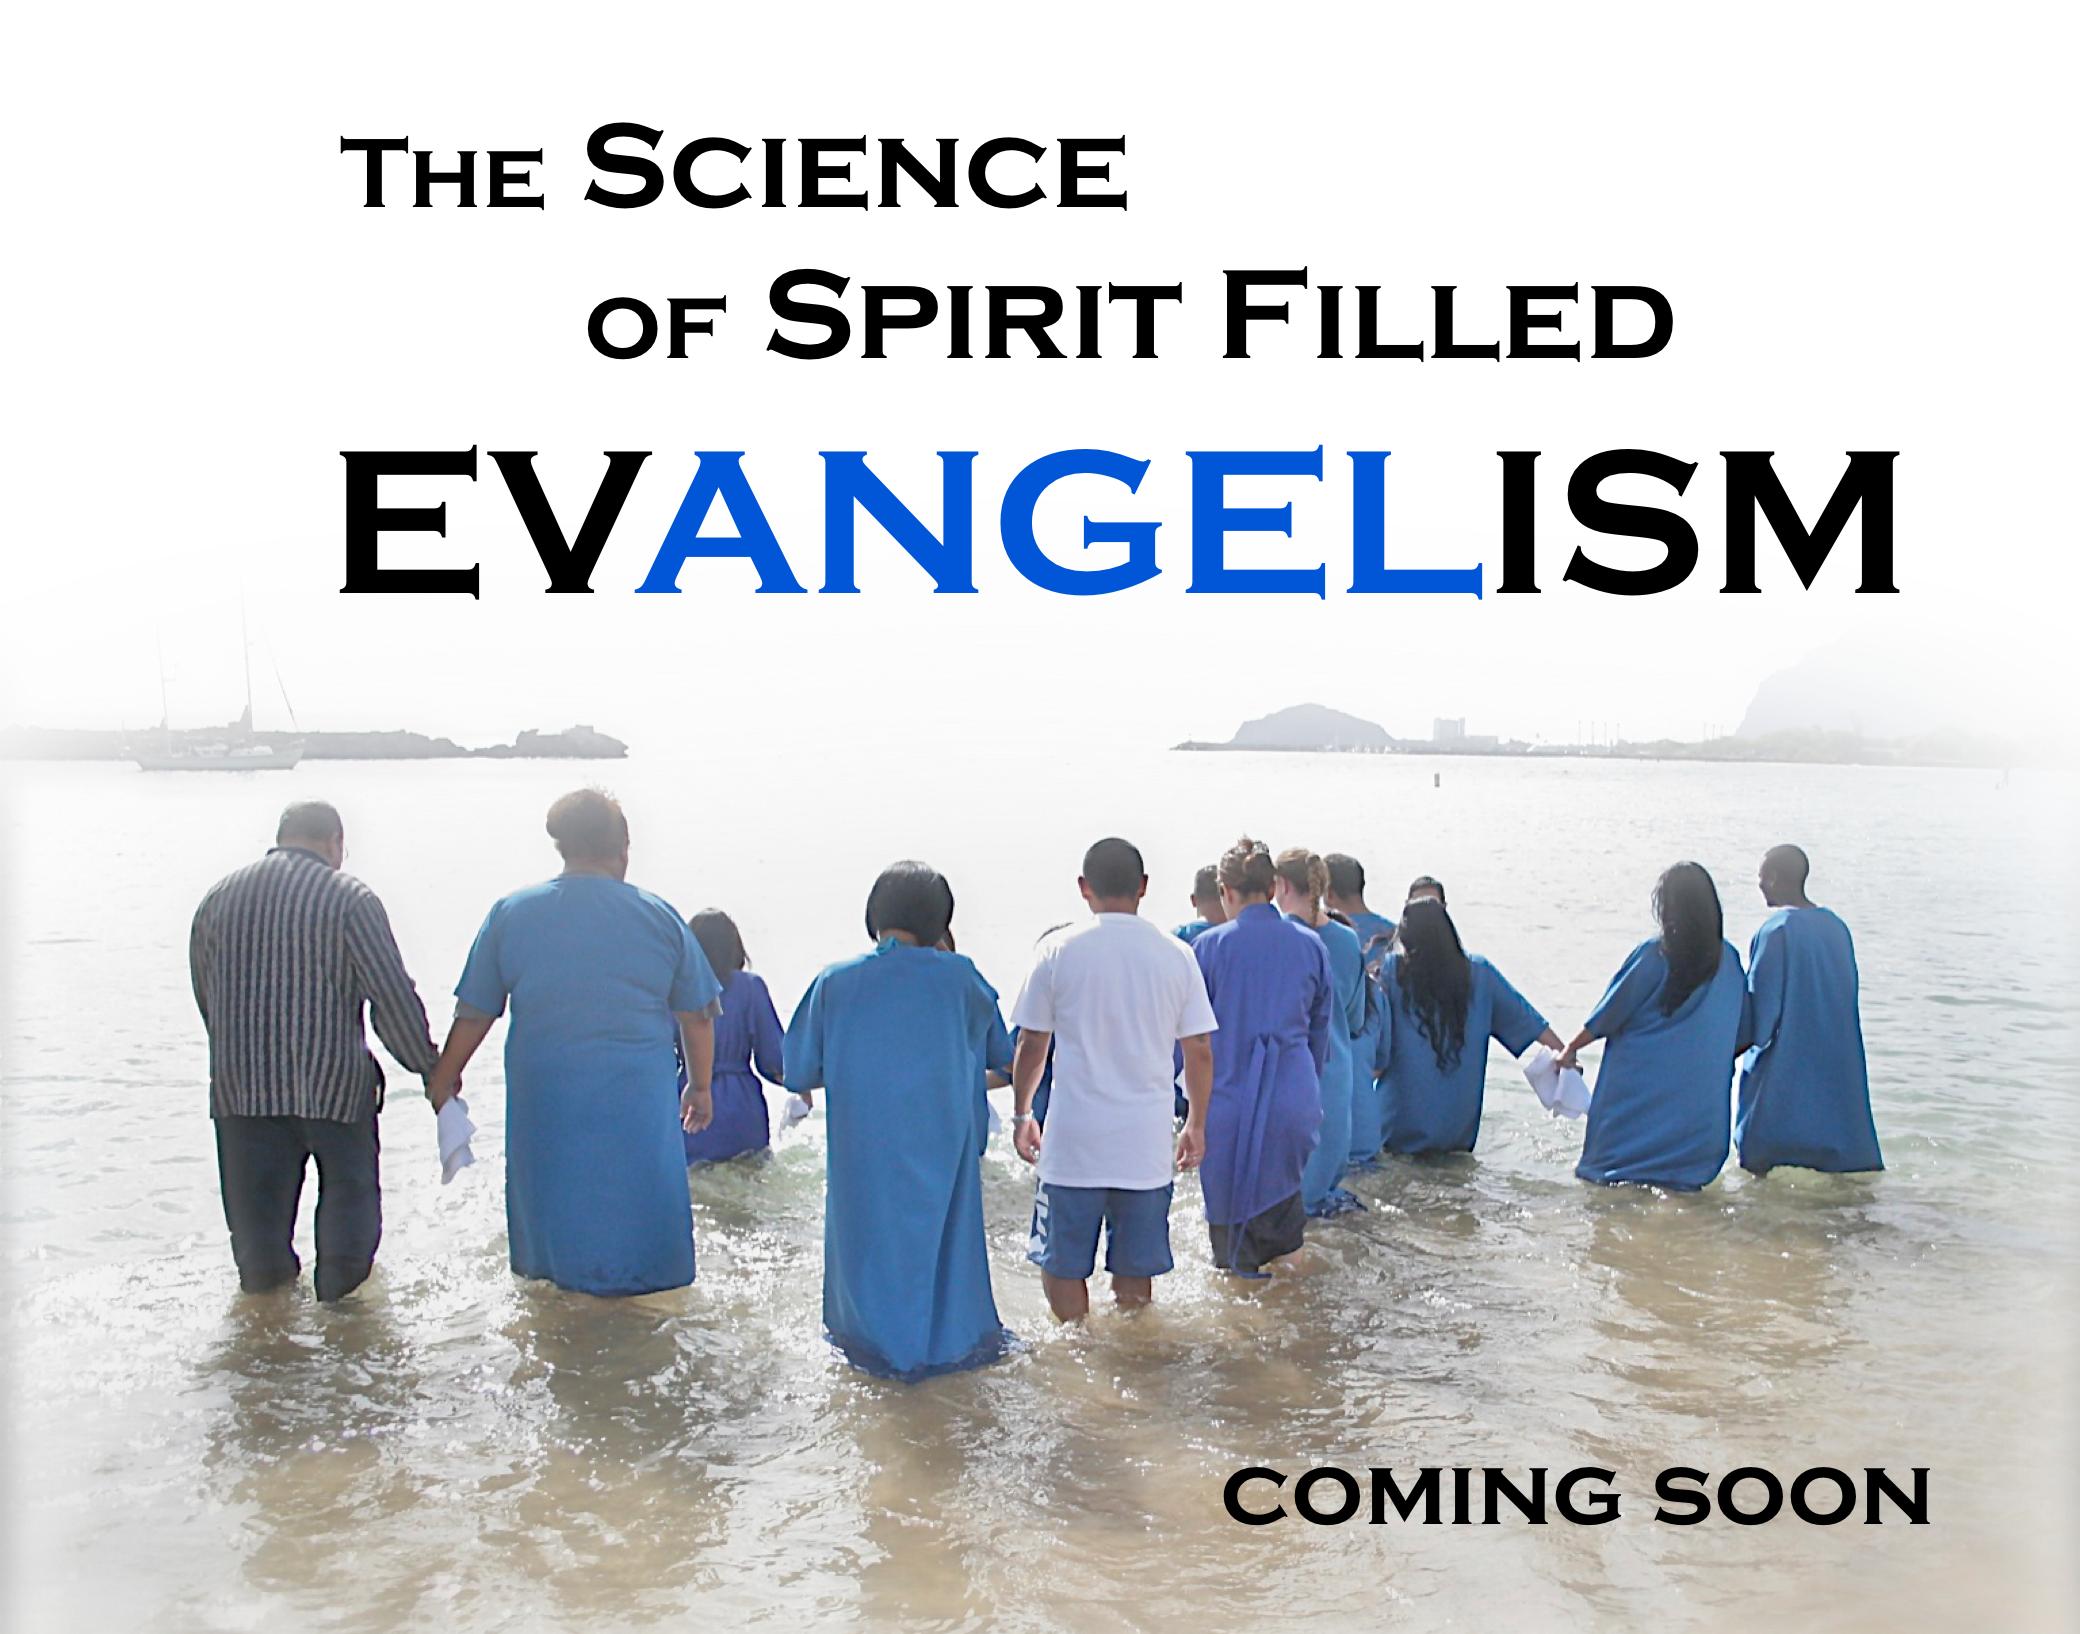 The Science of Spirit Filled Evangelism